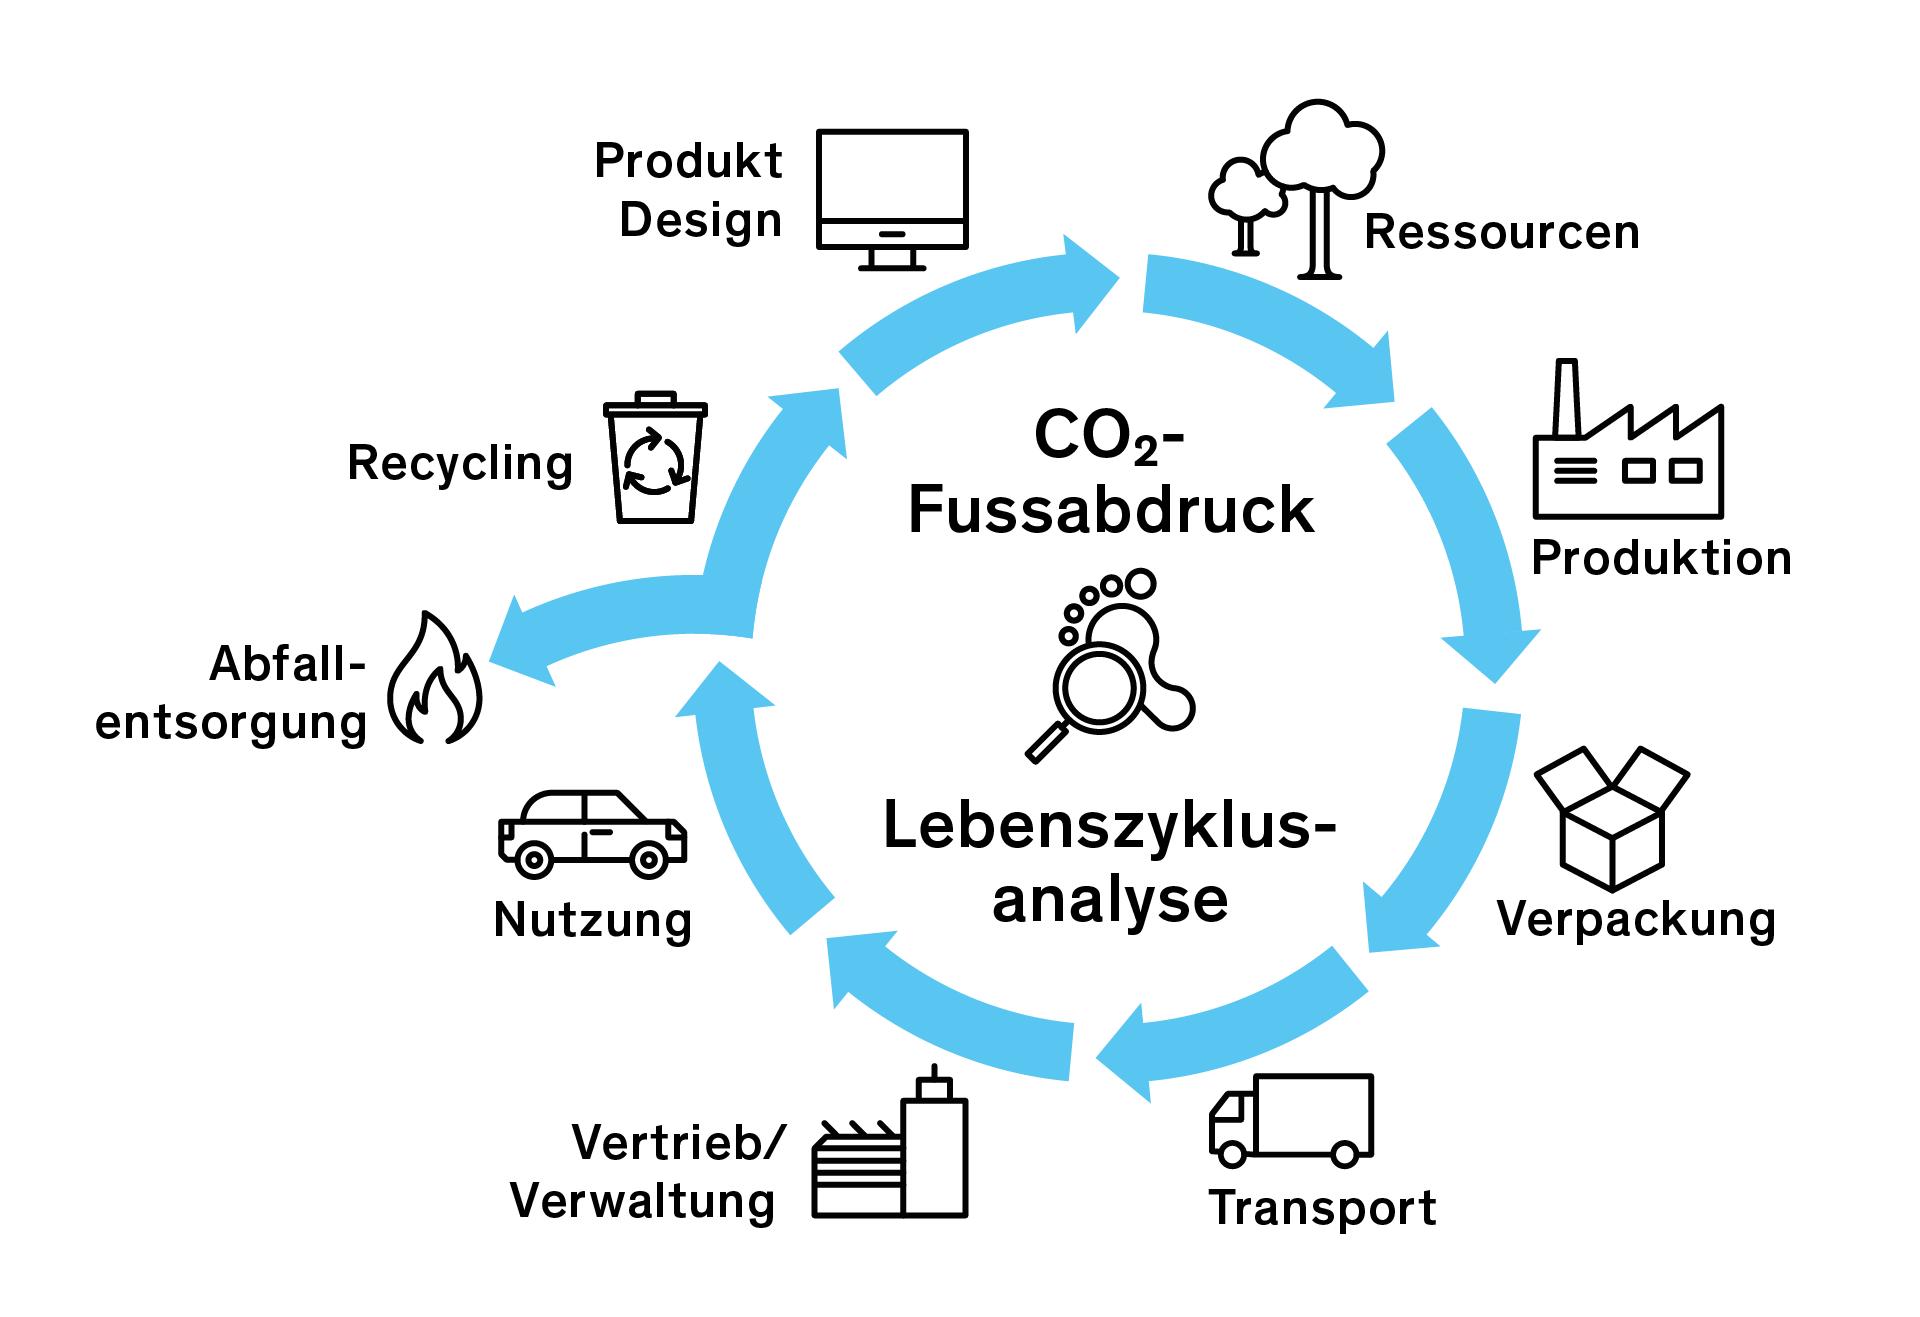 Preview image for LOM object Lieferketten und Produktlebenszyklus